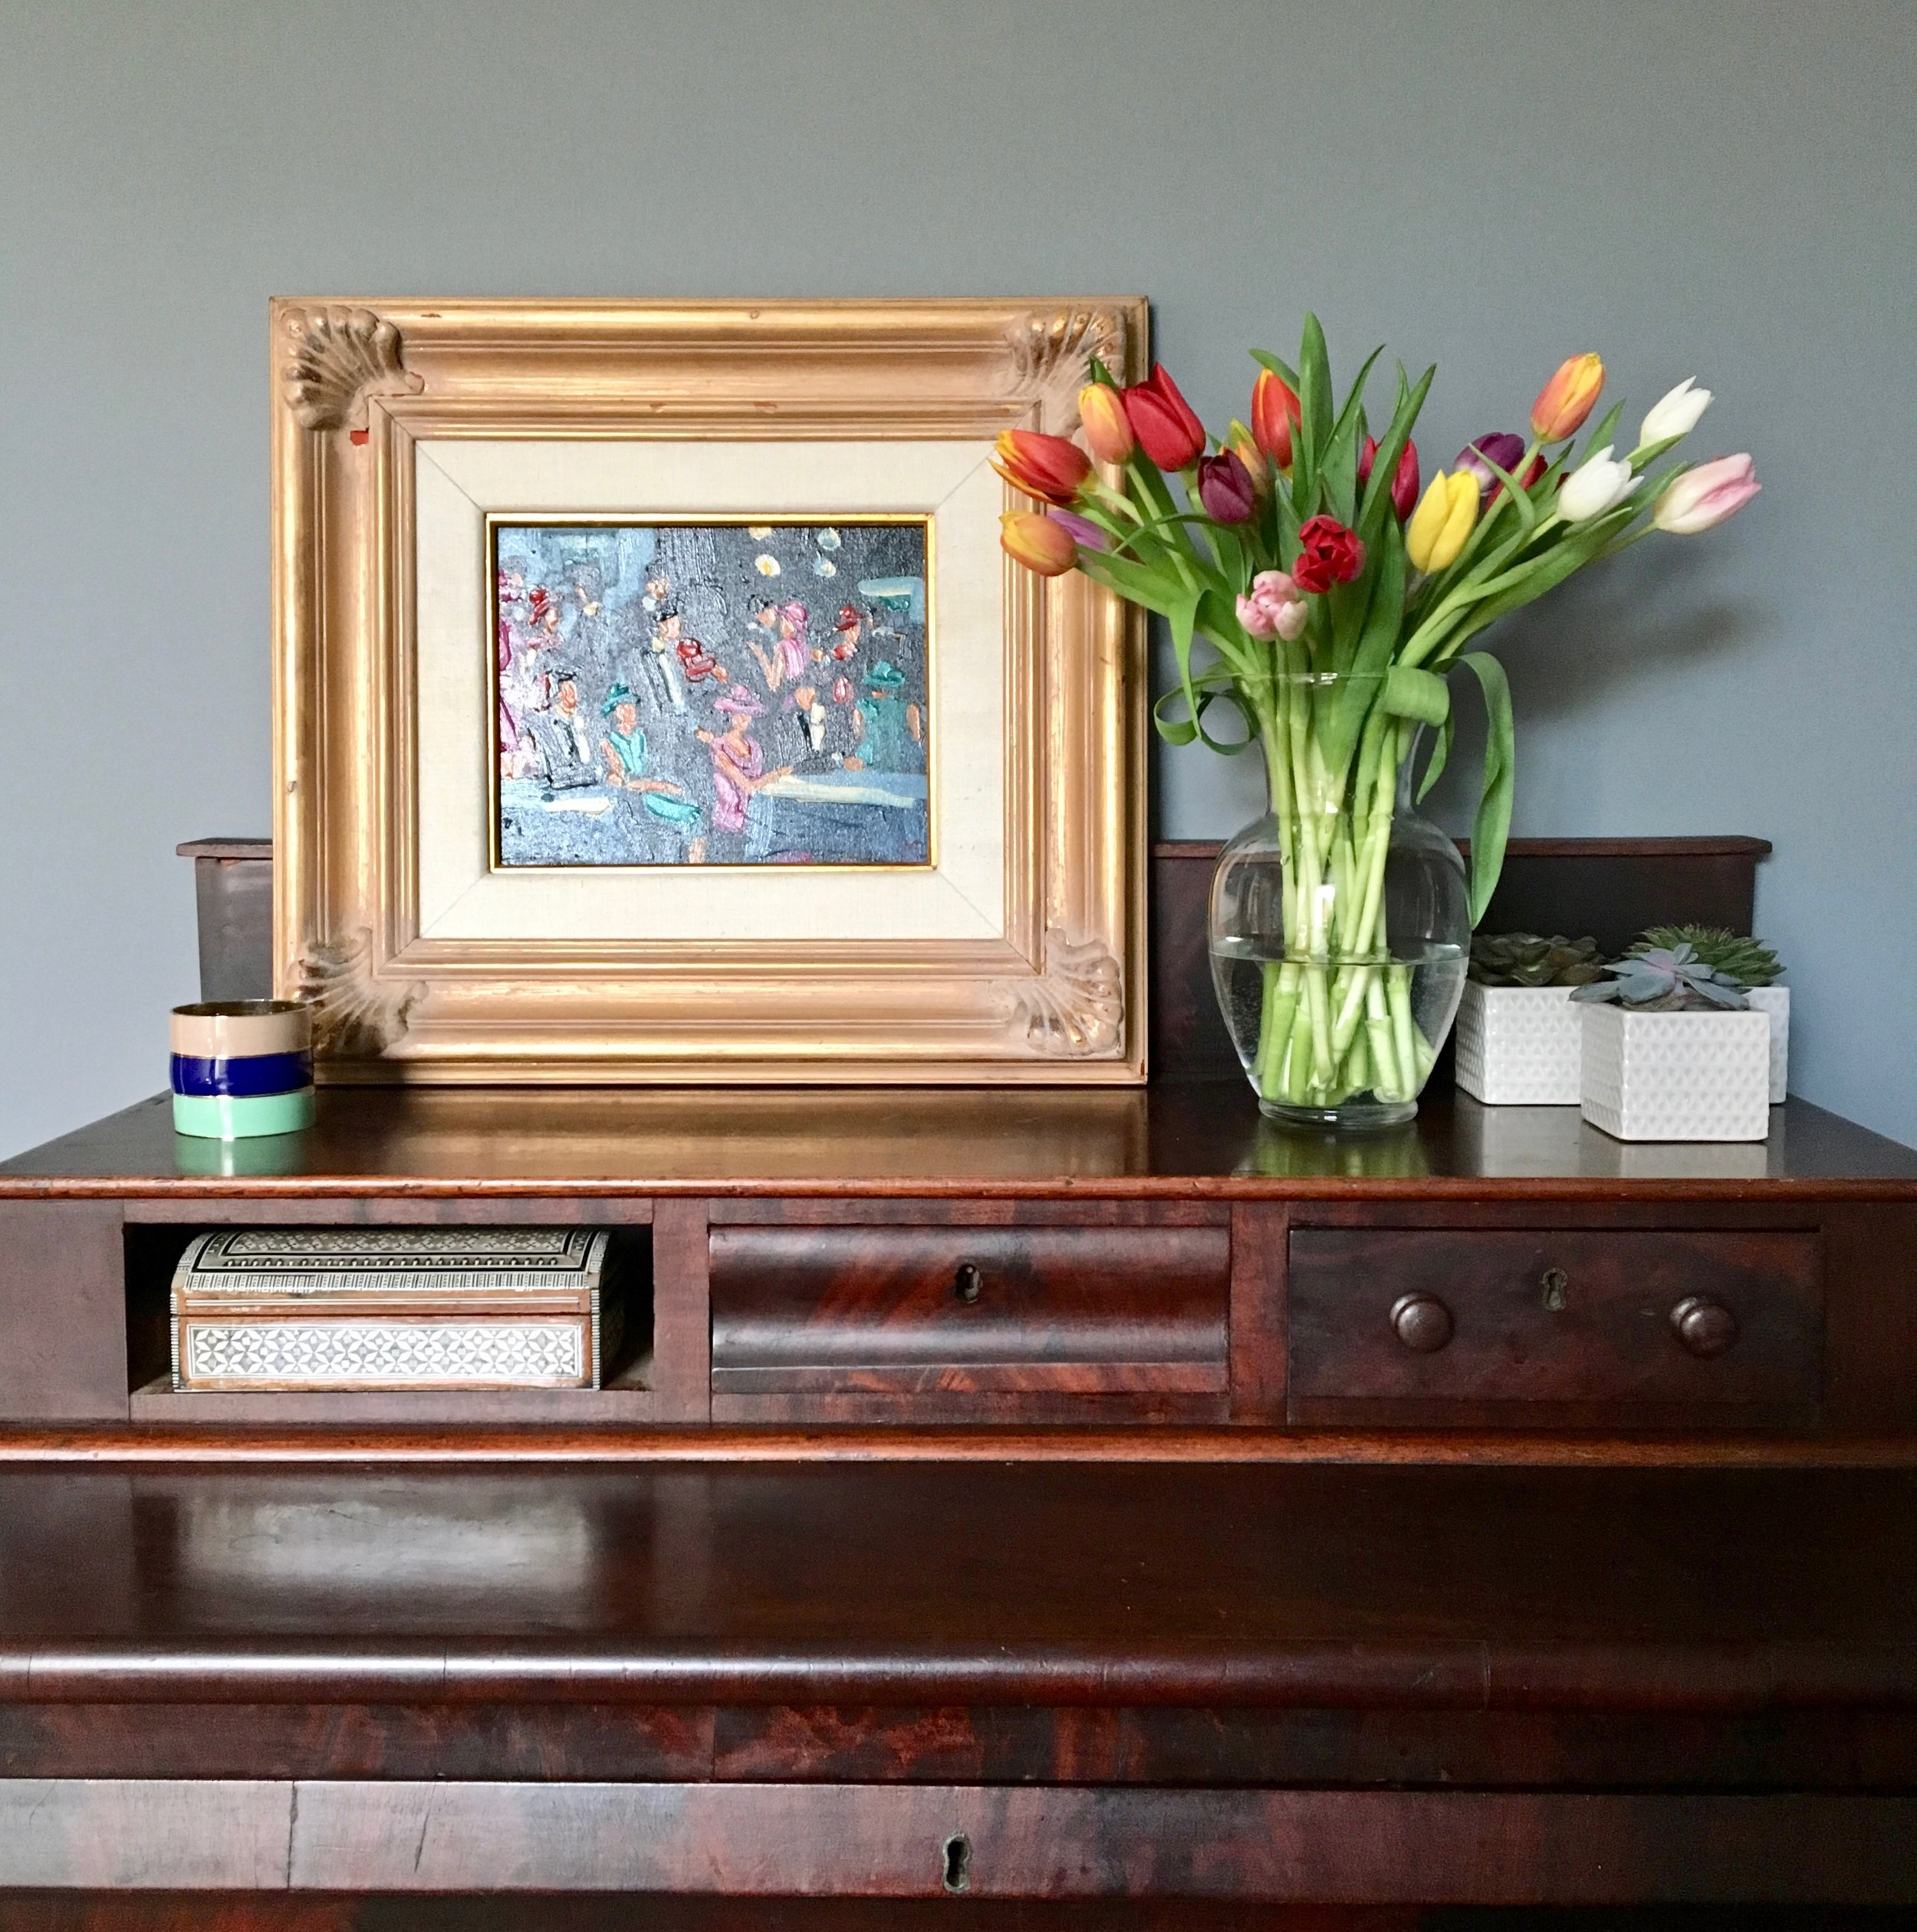 Liznylon_bedroom_colourful_art_and_flowers2.jpg